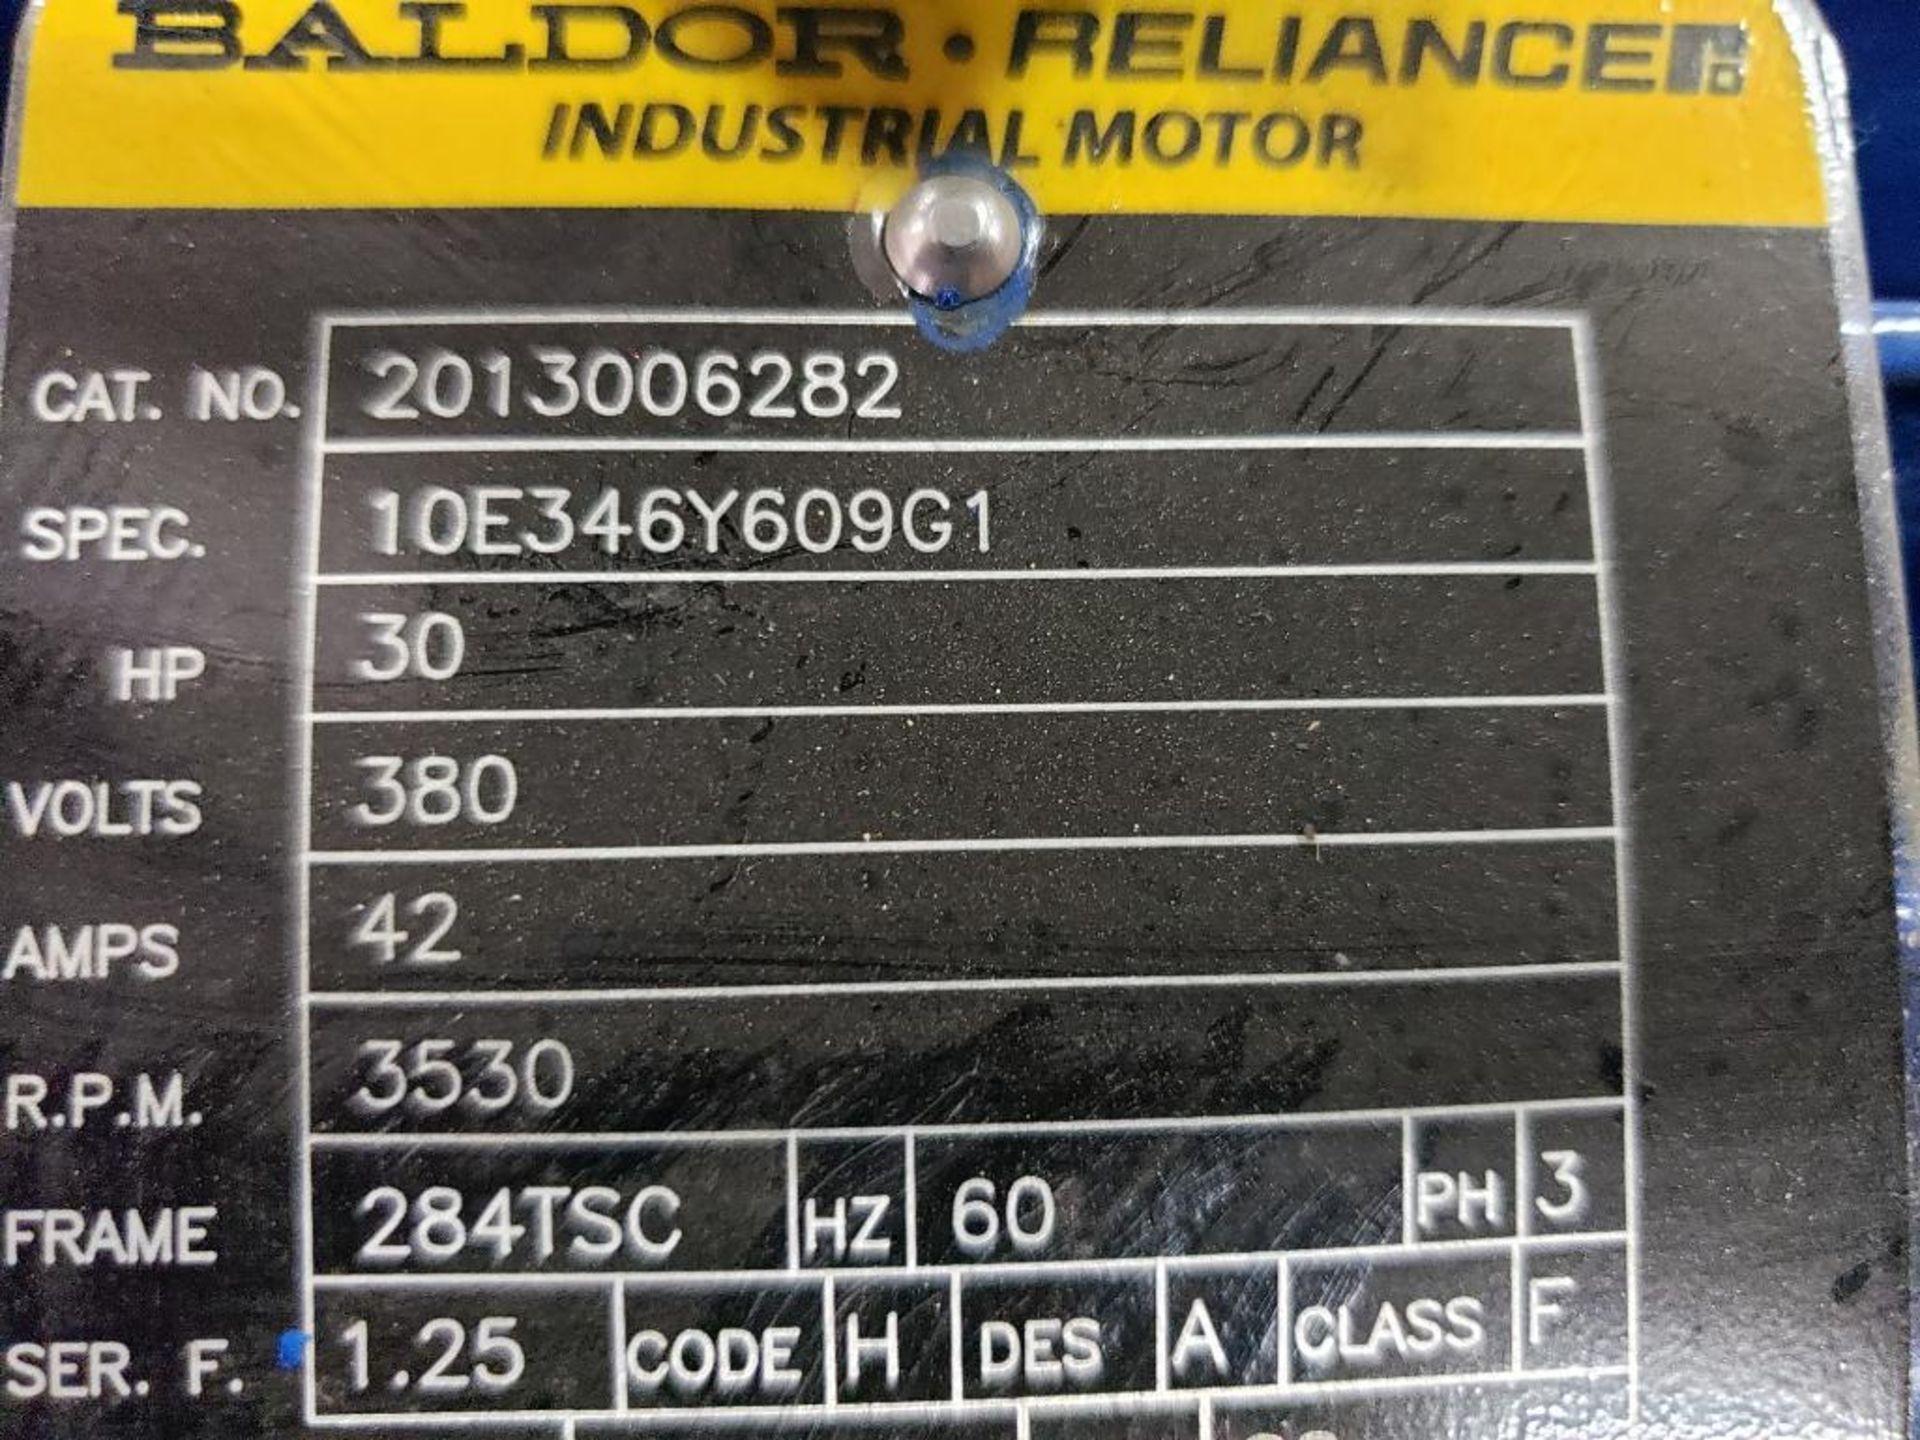 30HP Baldor Reliance 3PH motor. 2013006282. 380V, 3530RPM, 284TSC-Frame. - Image 3 of 8